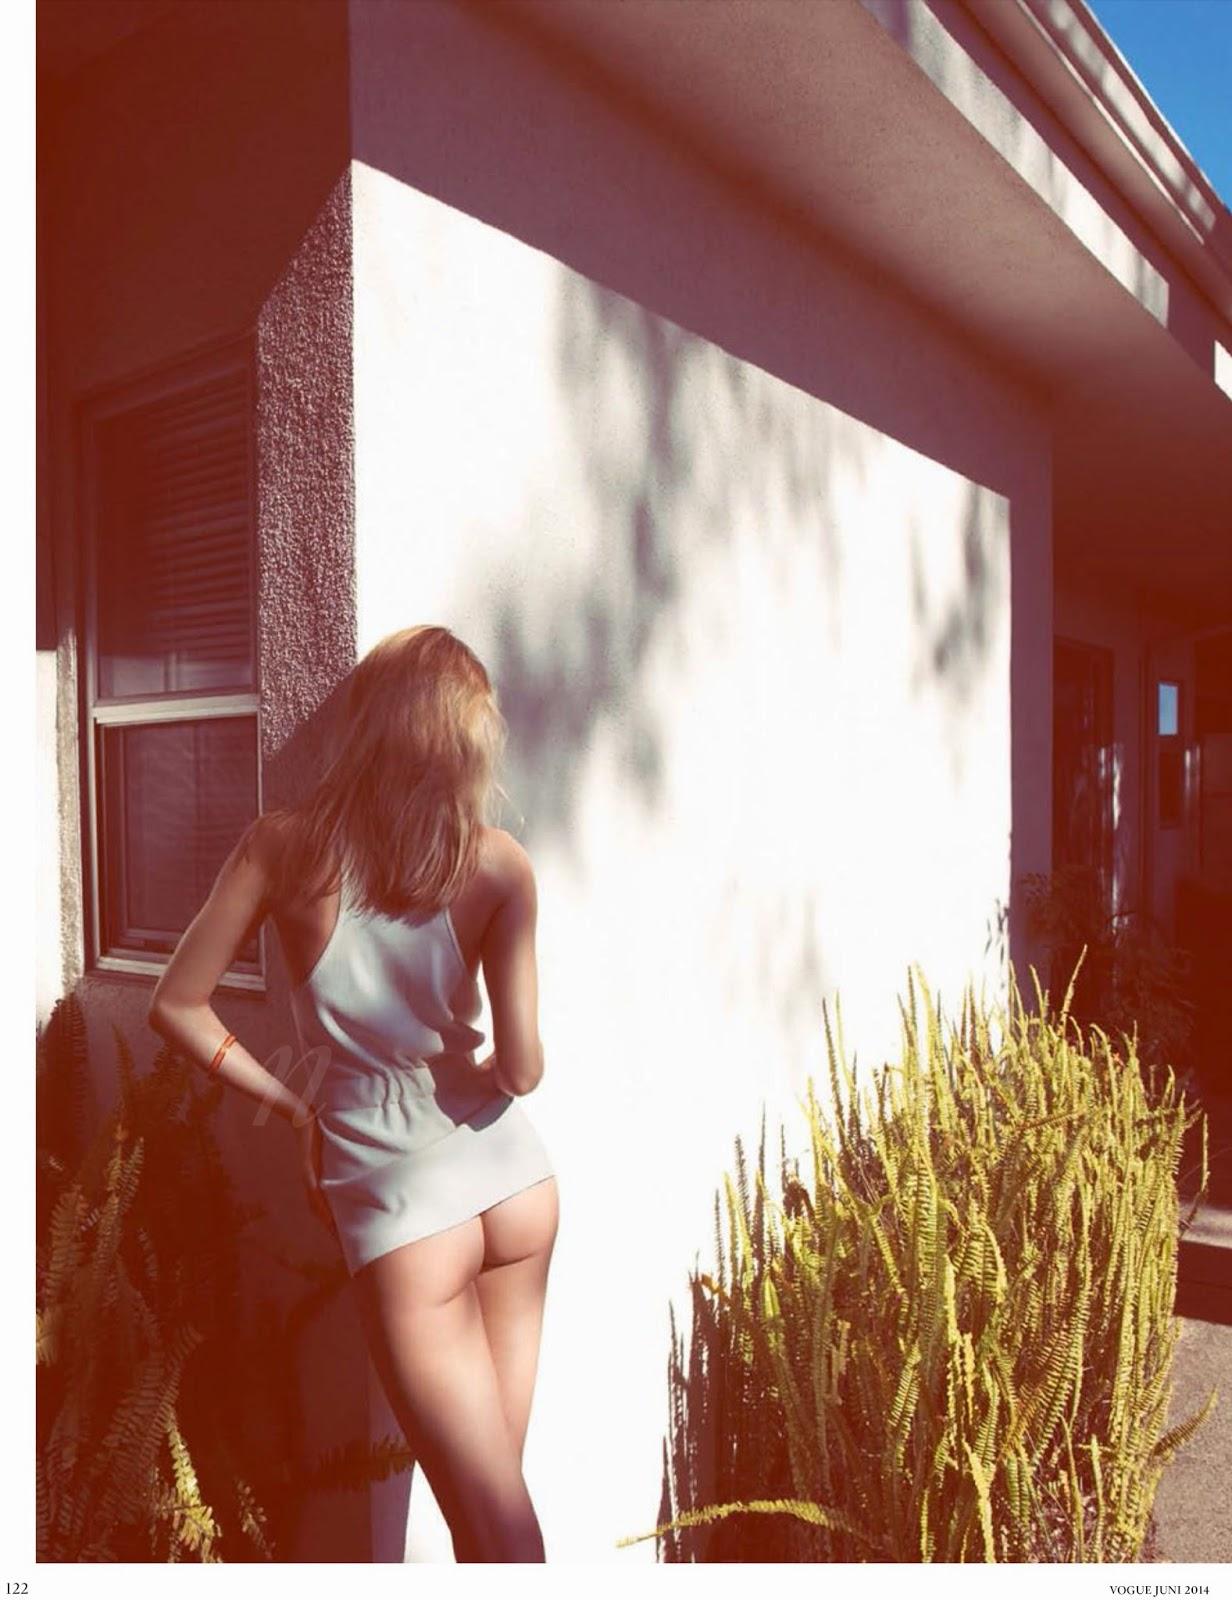 tumblr_n5mundXX7Z1s4m4juo2_r1_1280